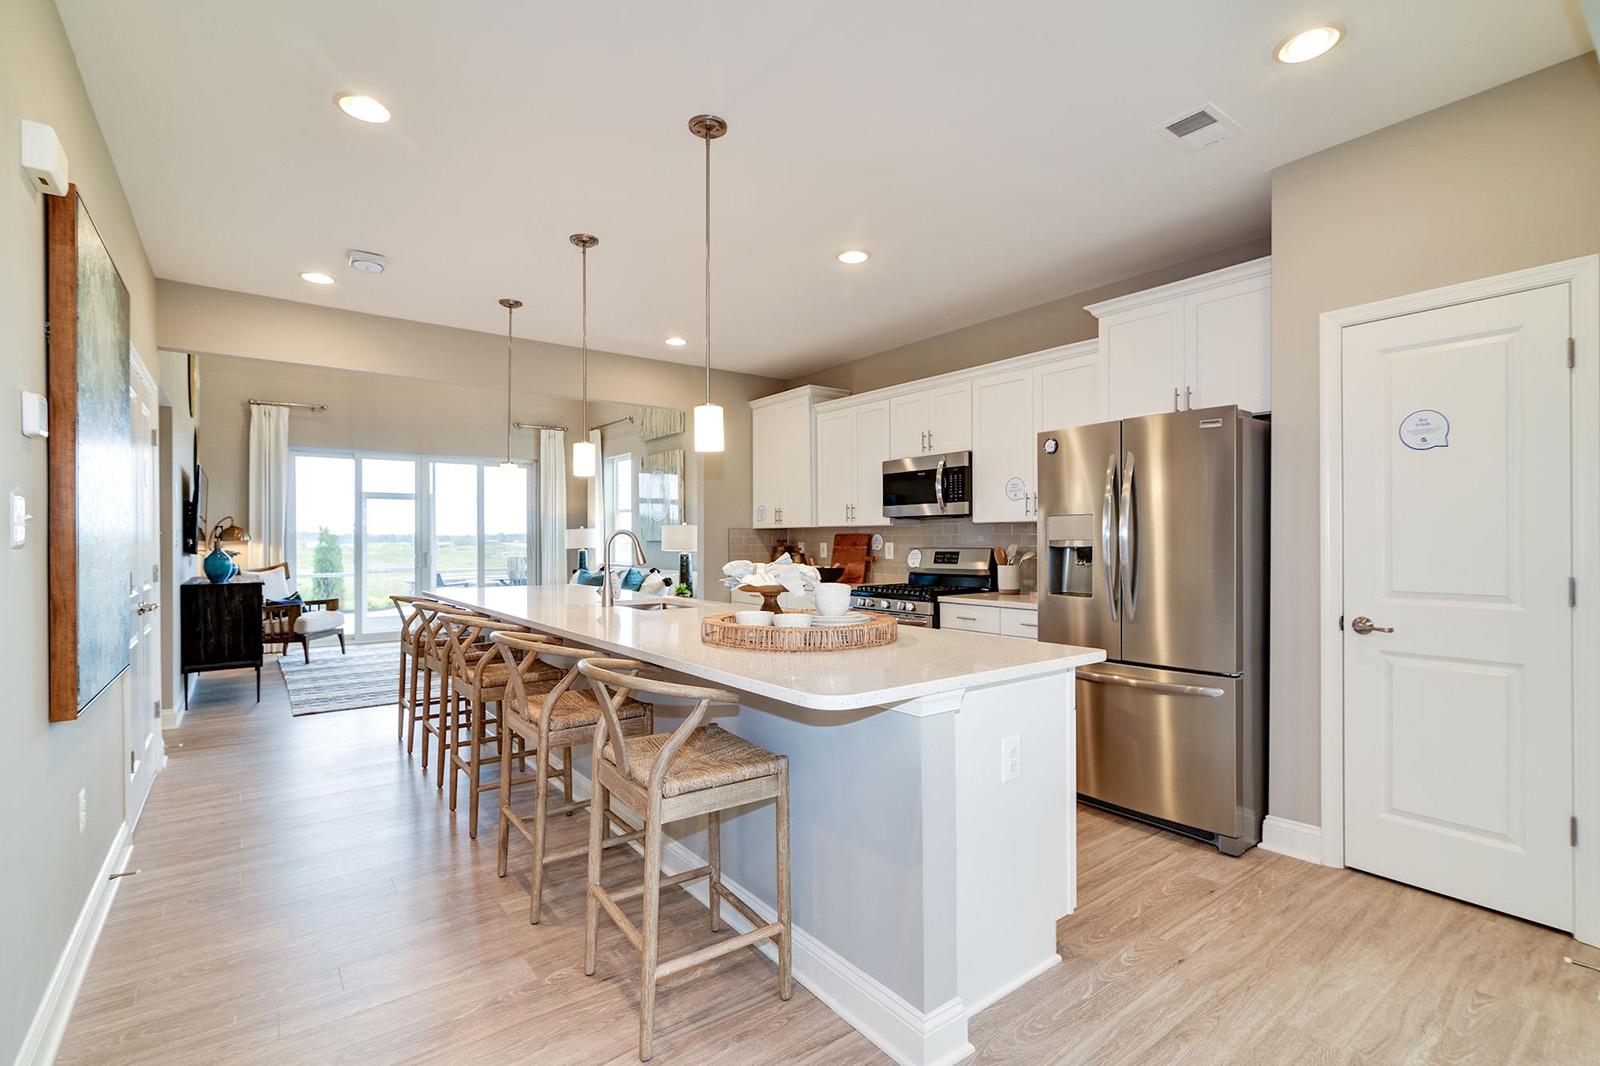 Amblebrook-Lennar-Jennings-Kitchen